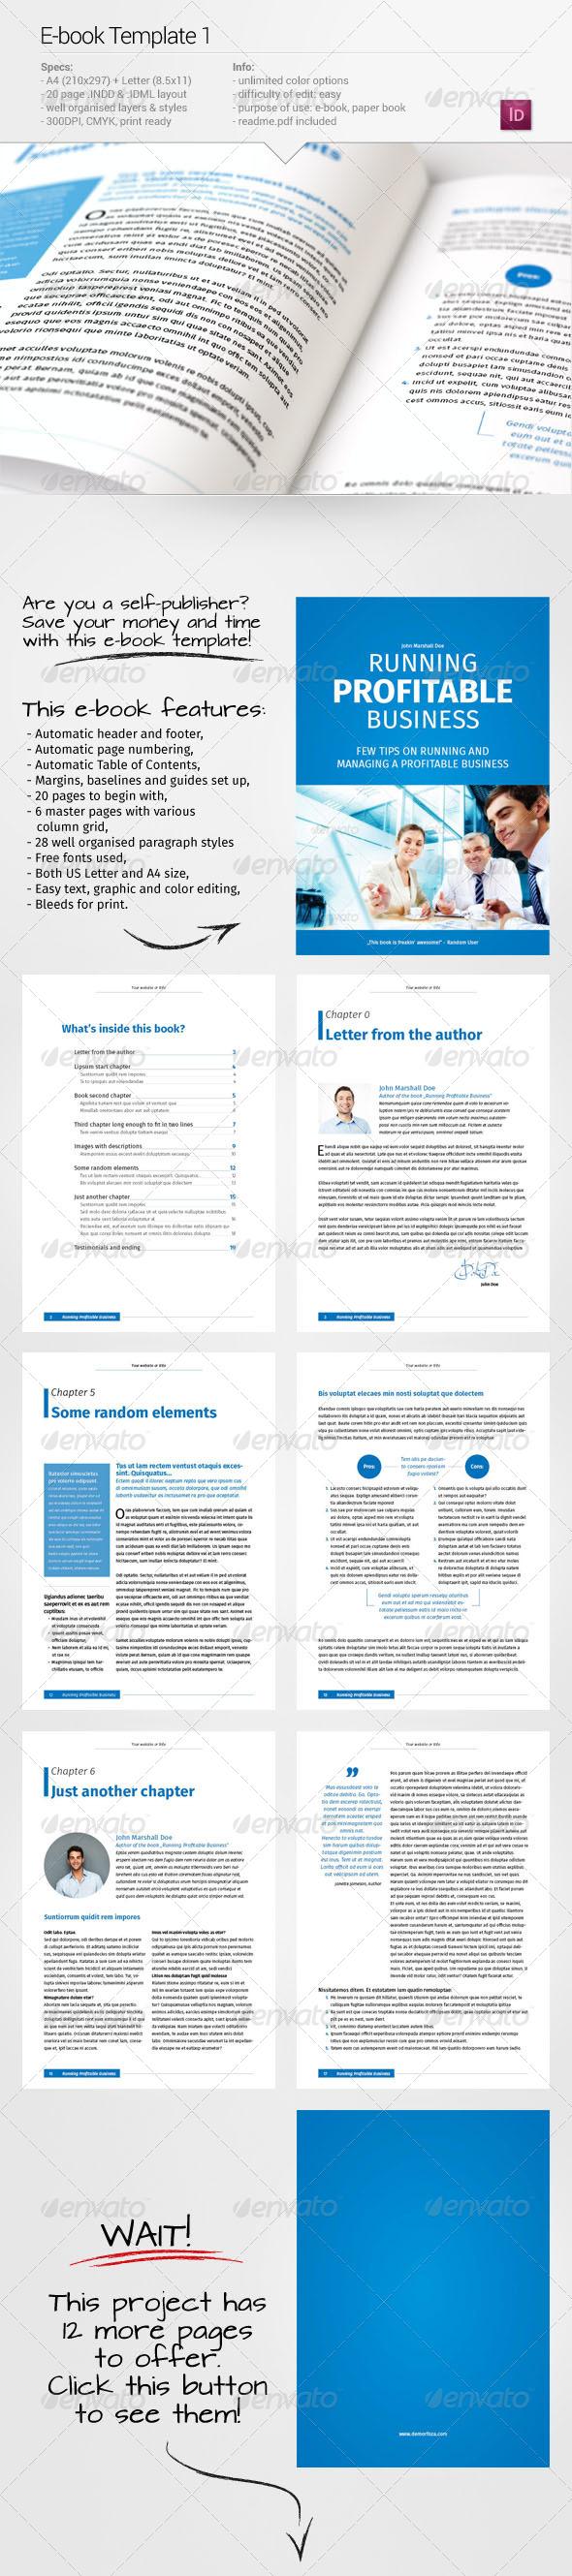 E-book Template 1 - Digital Books ePublishing